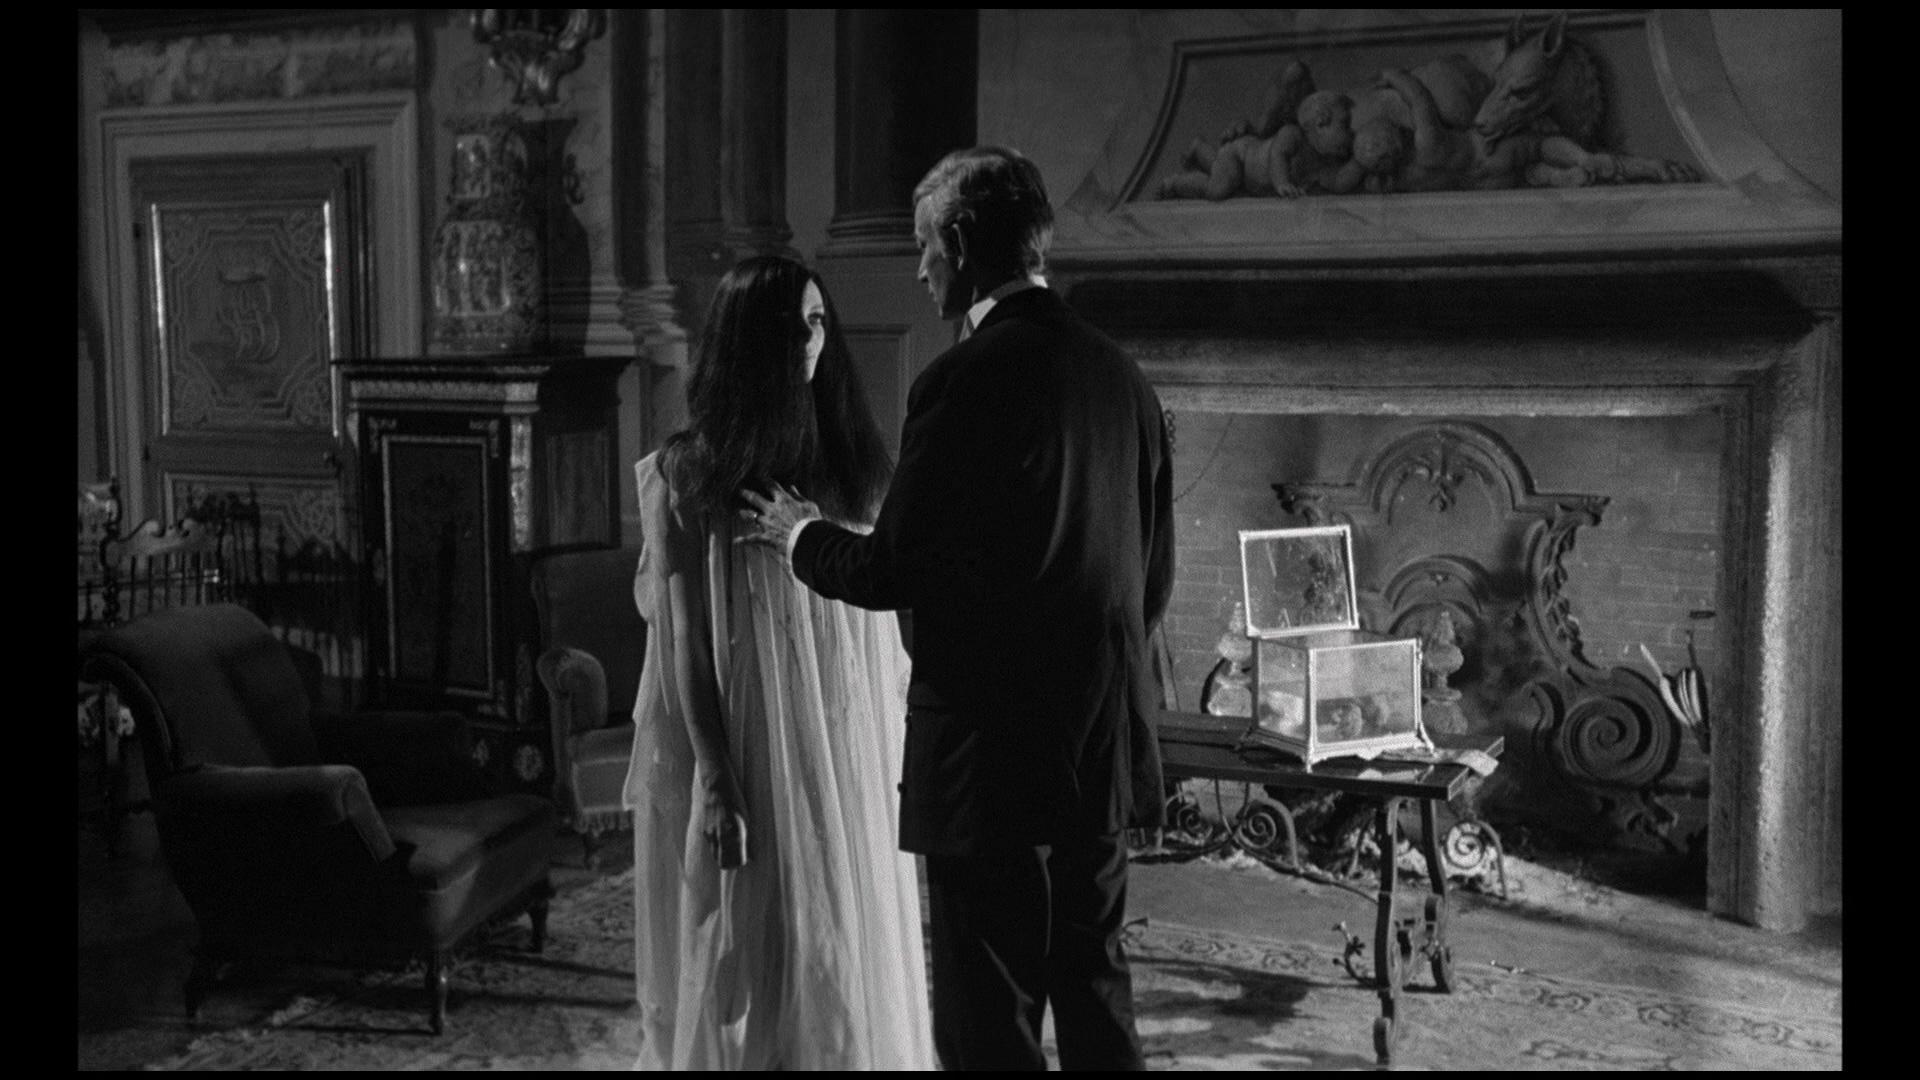 Paul Muller and Barbara Steele in Amanti d'oltretomba (1965)